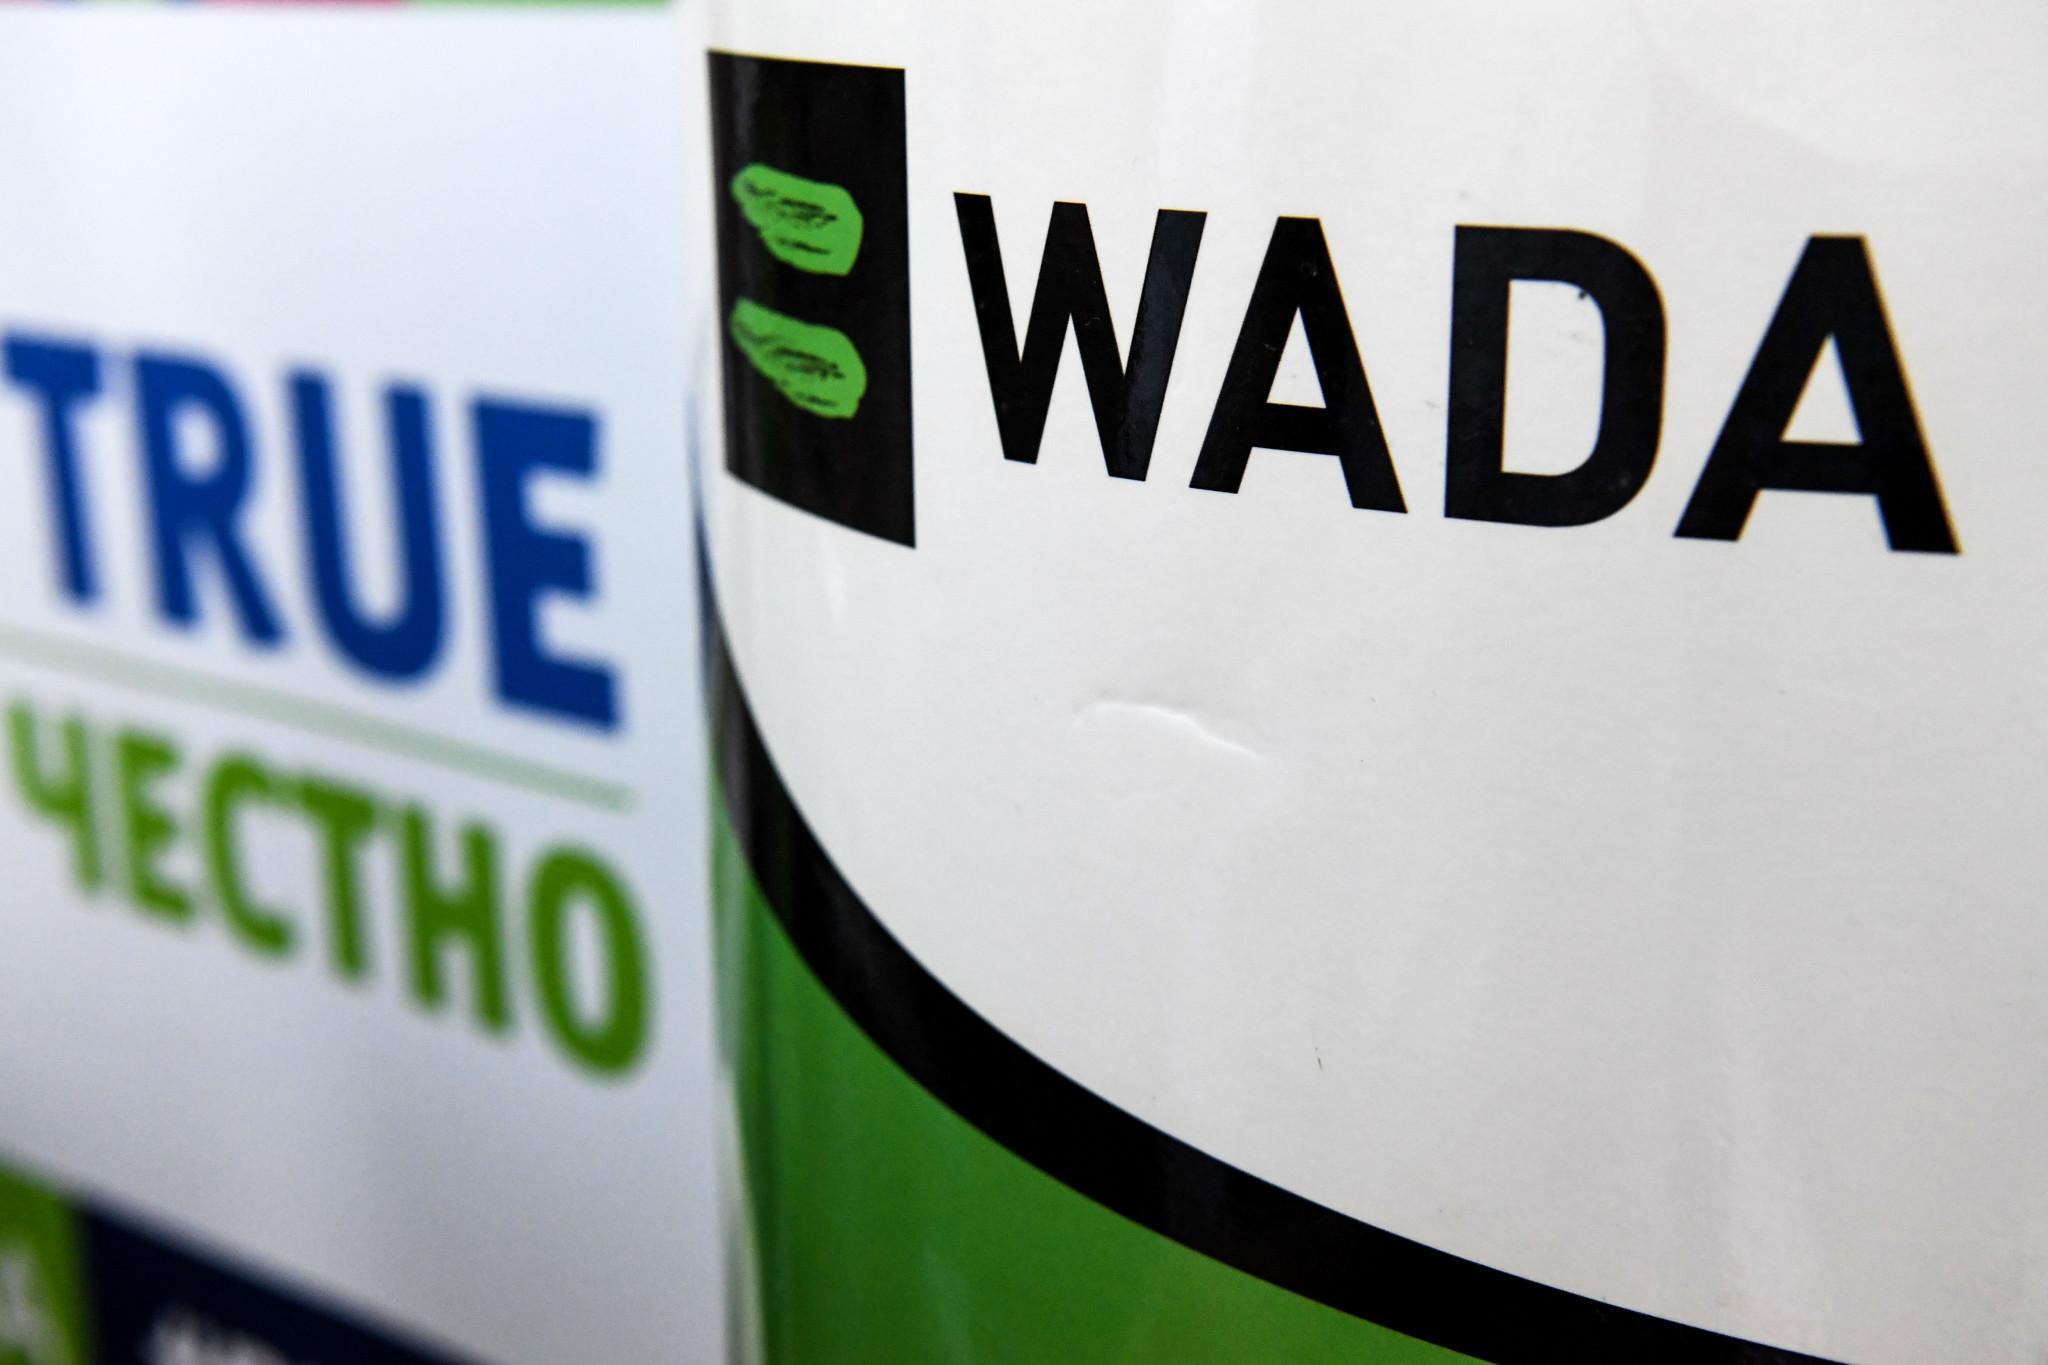 Improper conduct investigation cost WADA nearly $1.6 million